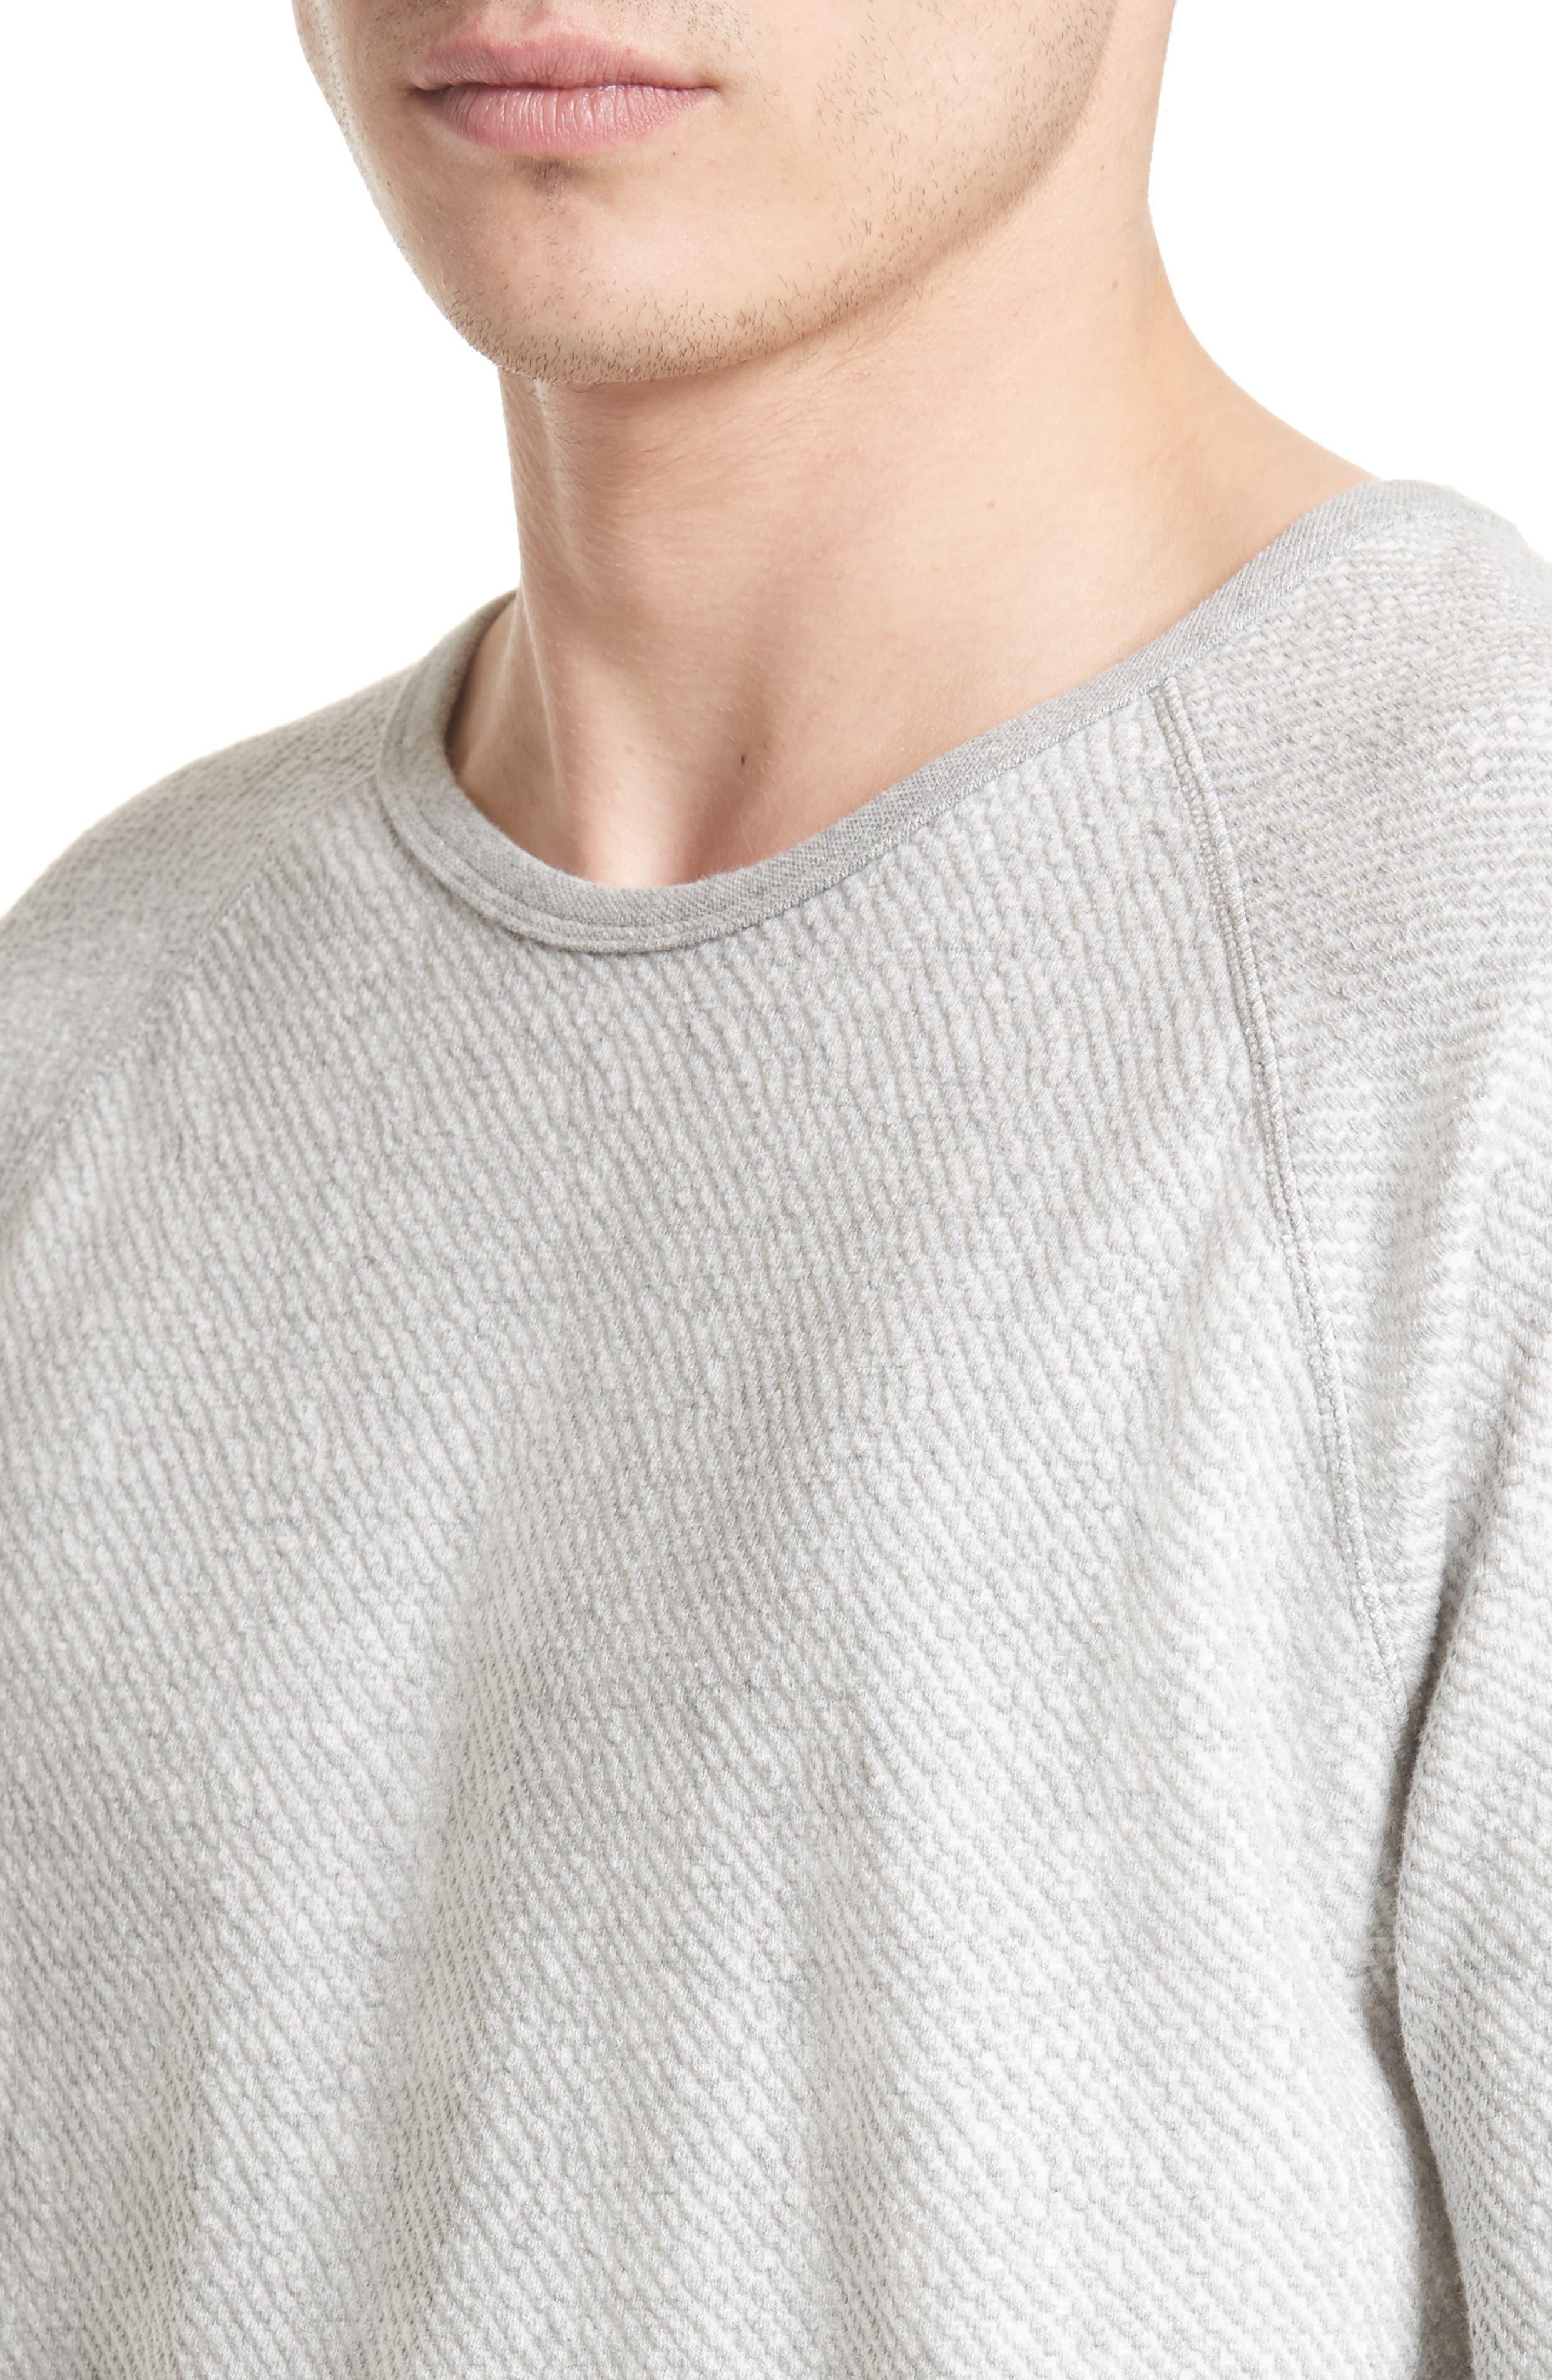 Kasu Sweater,                             Alternate thumbnail 4, color,                             035